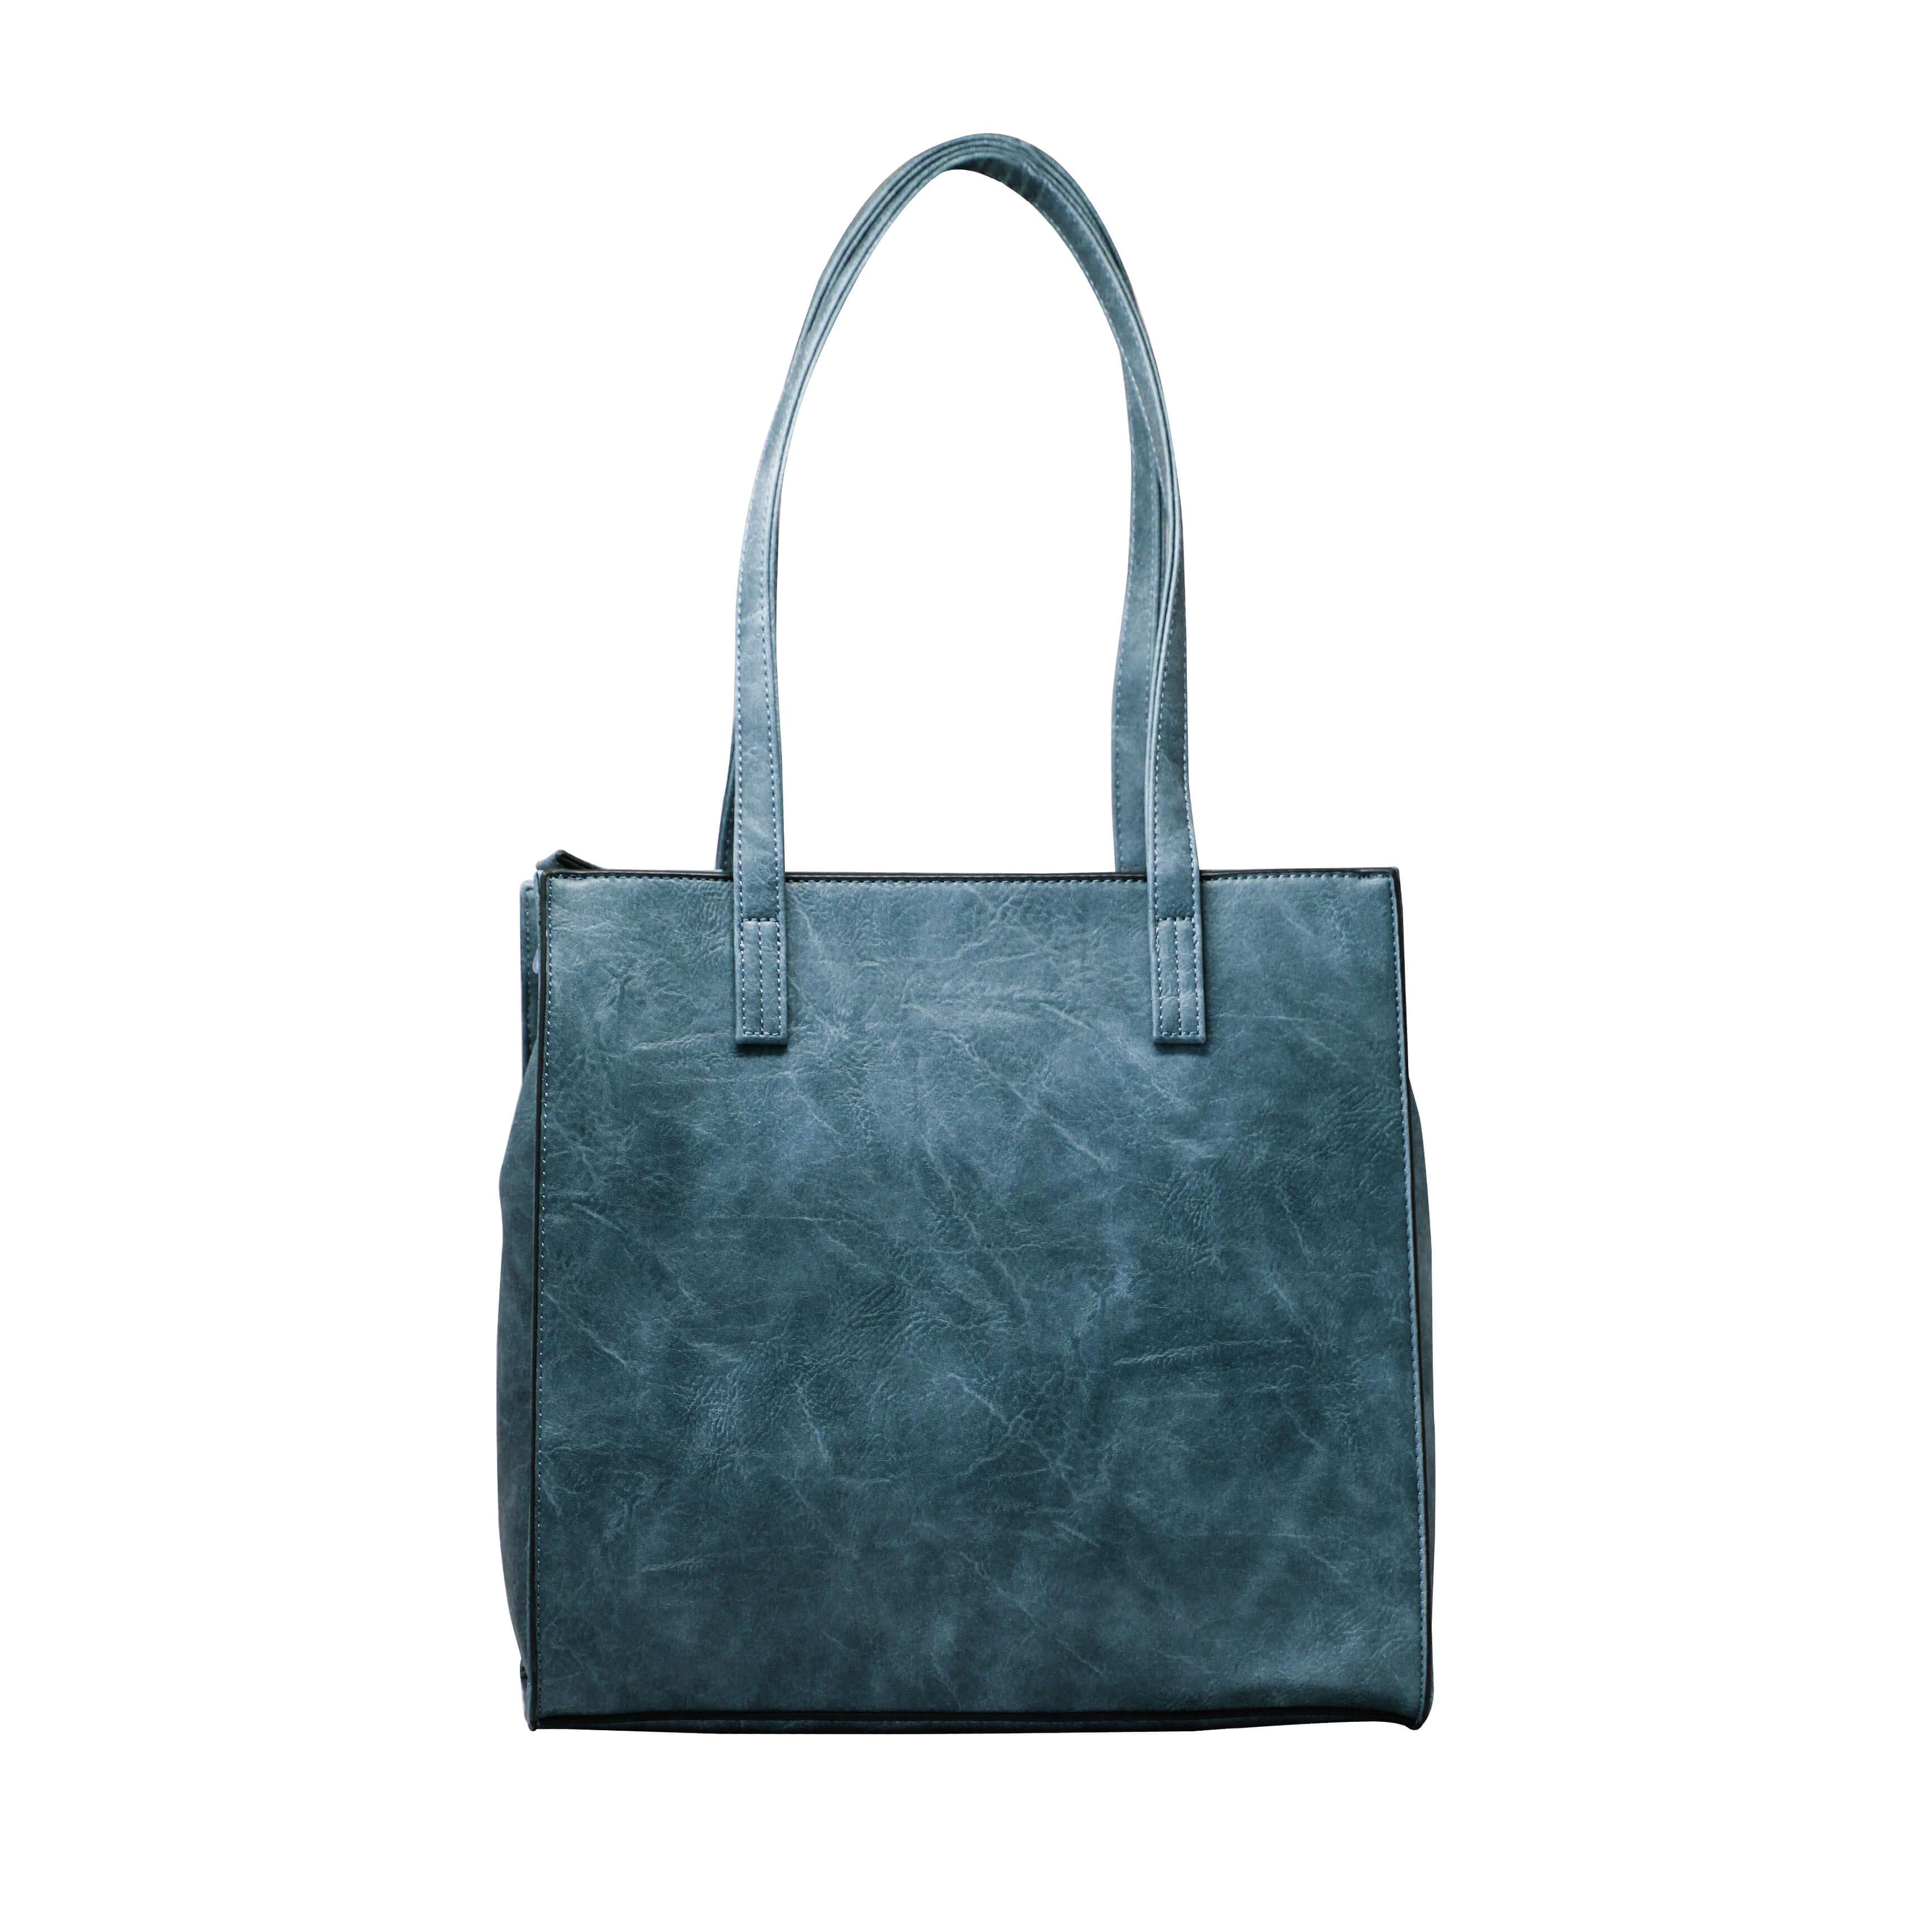 RECTANGULAR BOARDED BAG (RB)-BLUE 8